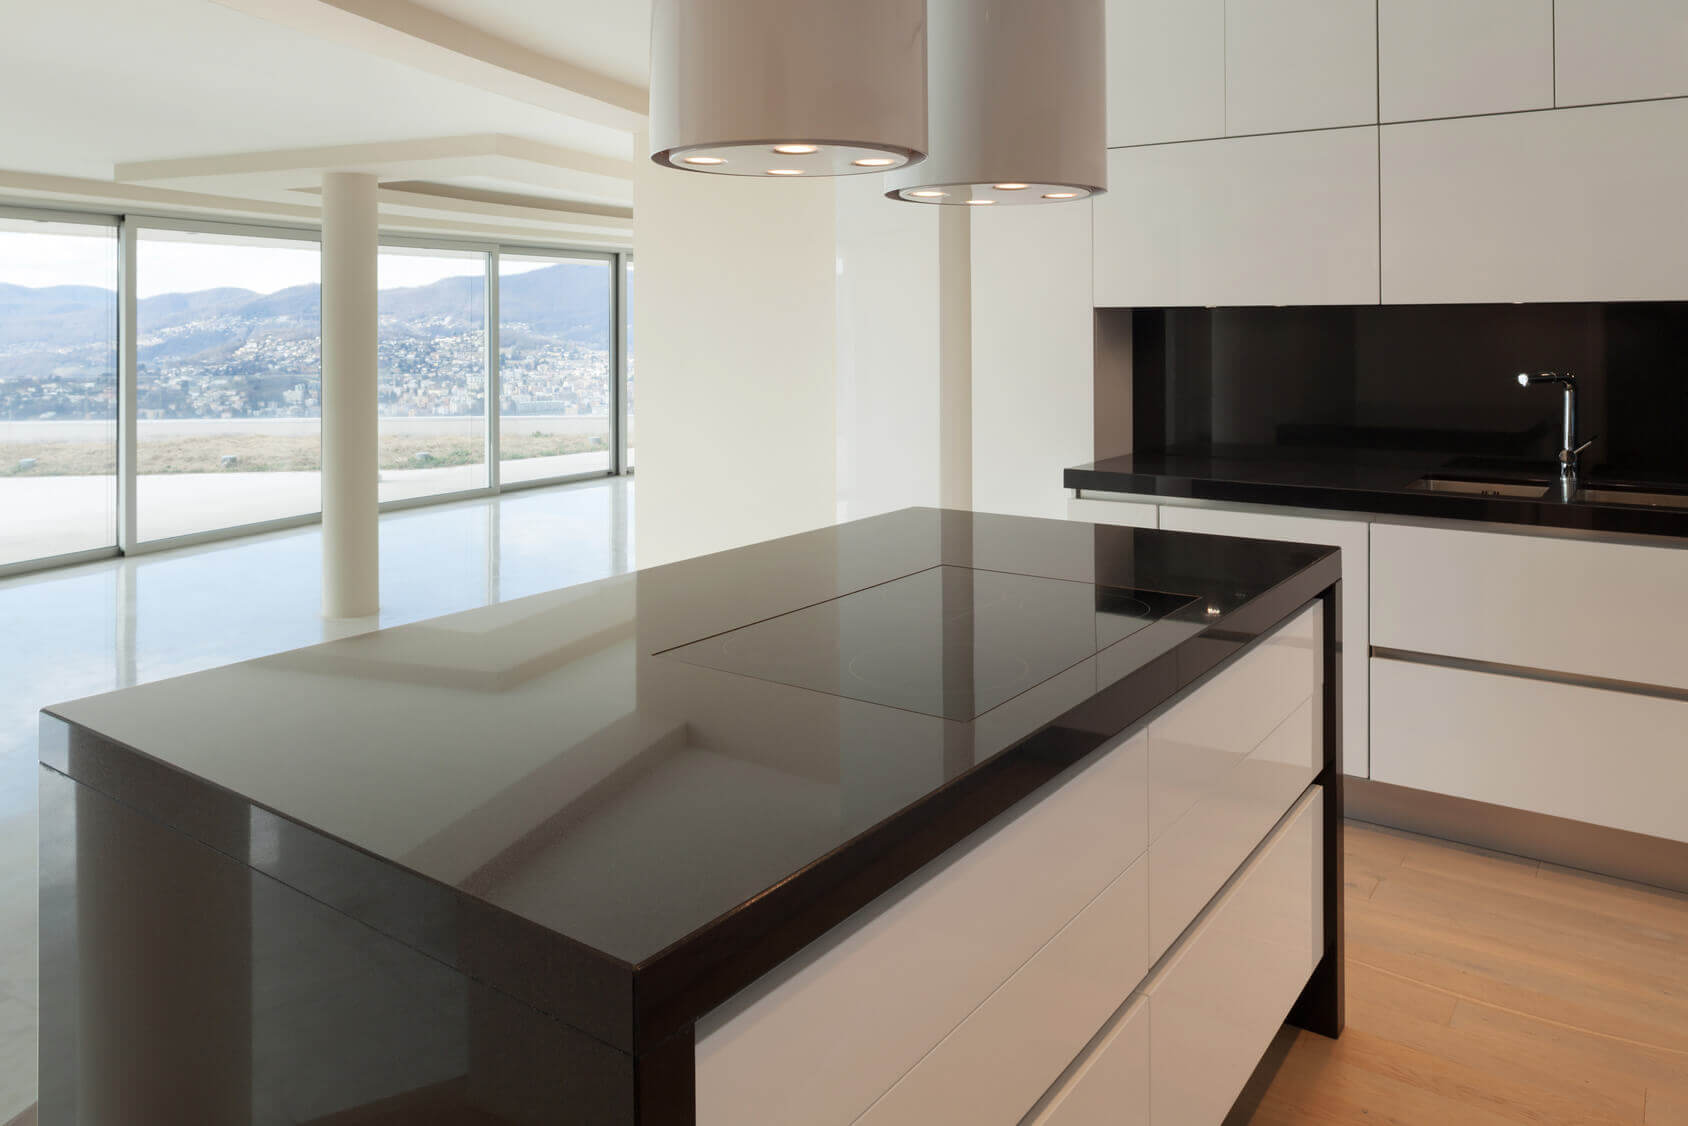 Glasarbeitsplatten nach Maß | Glasheld